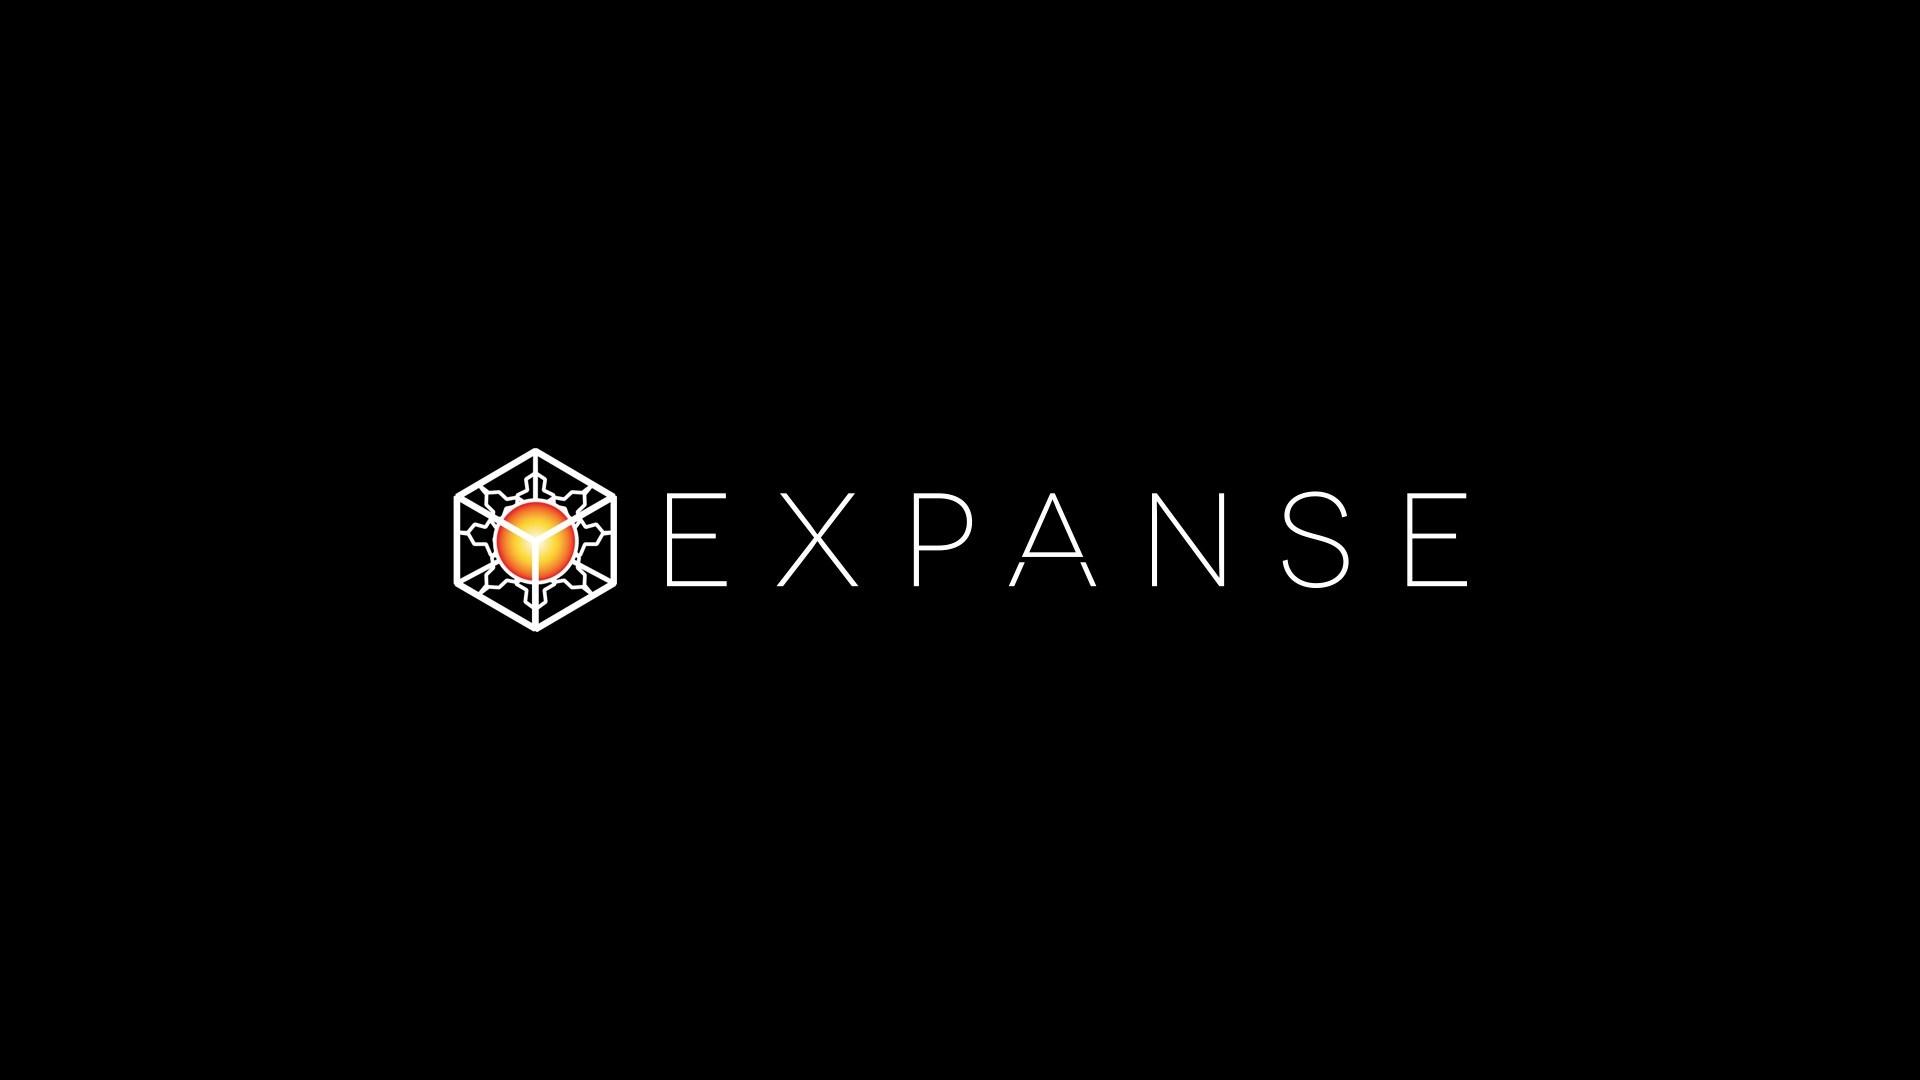 Expanse(エクスパンセ)とは|仮想通貨の特徴・価格・チャート・取引所